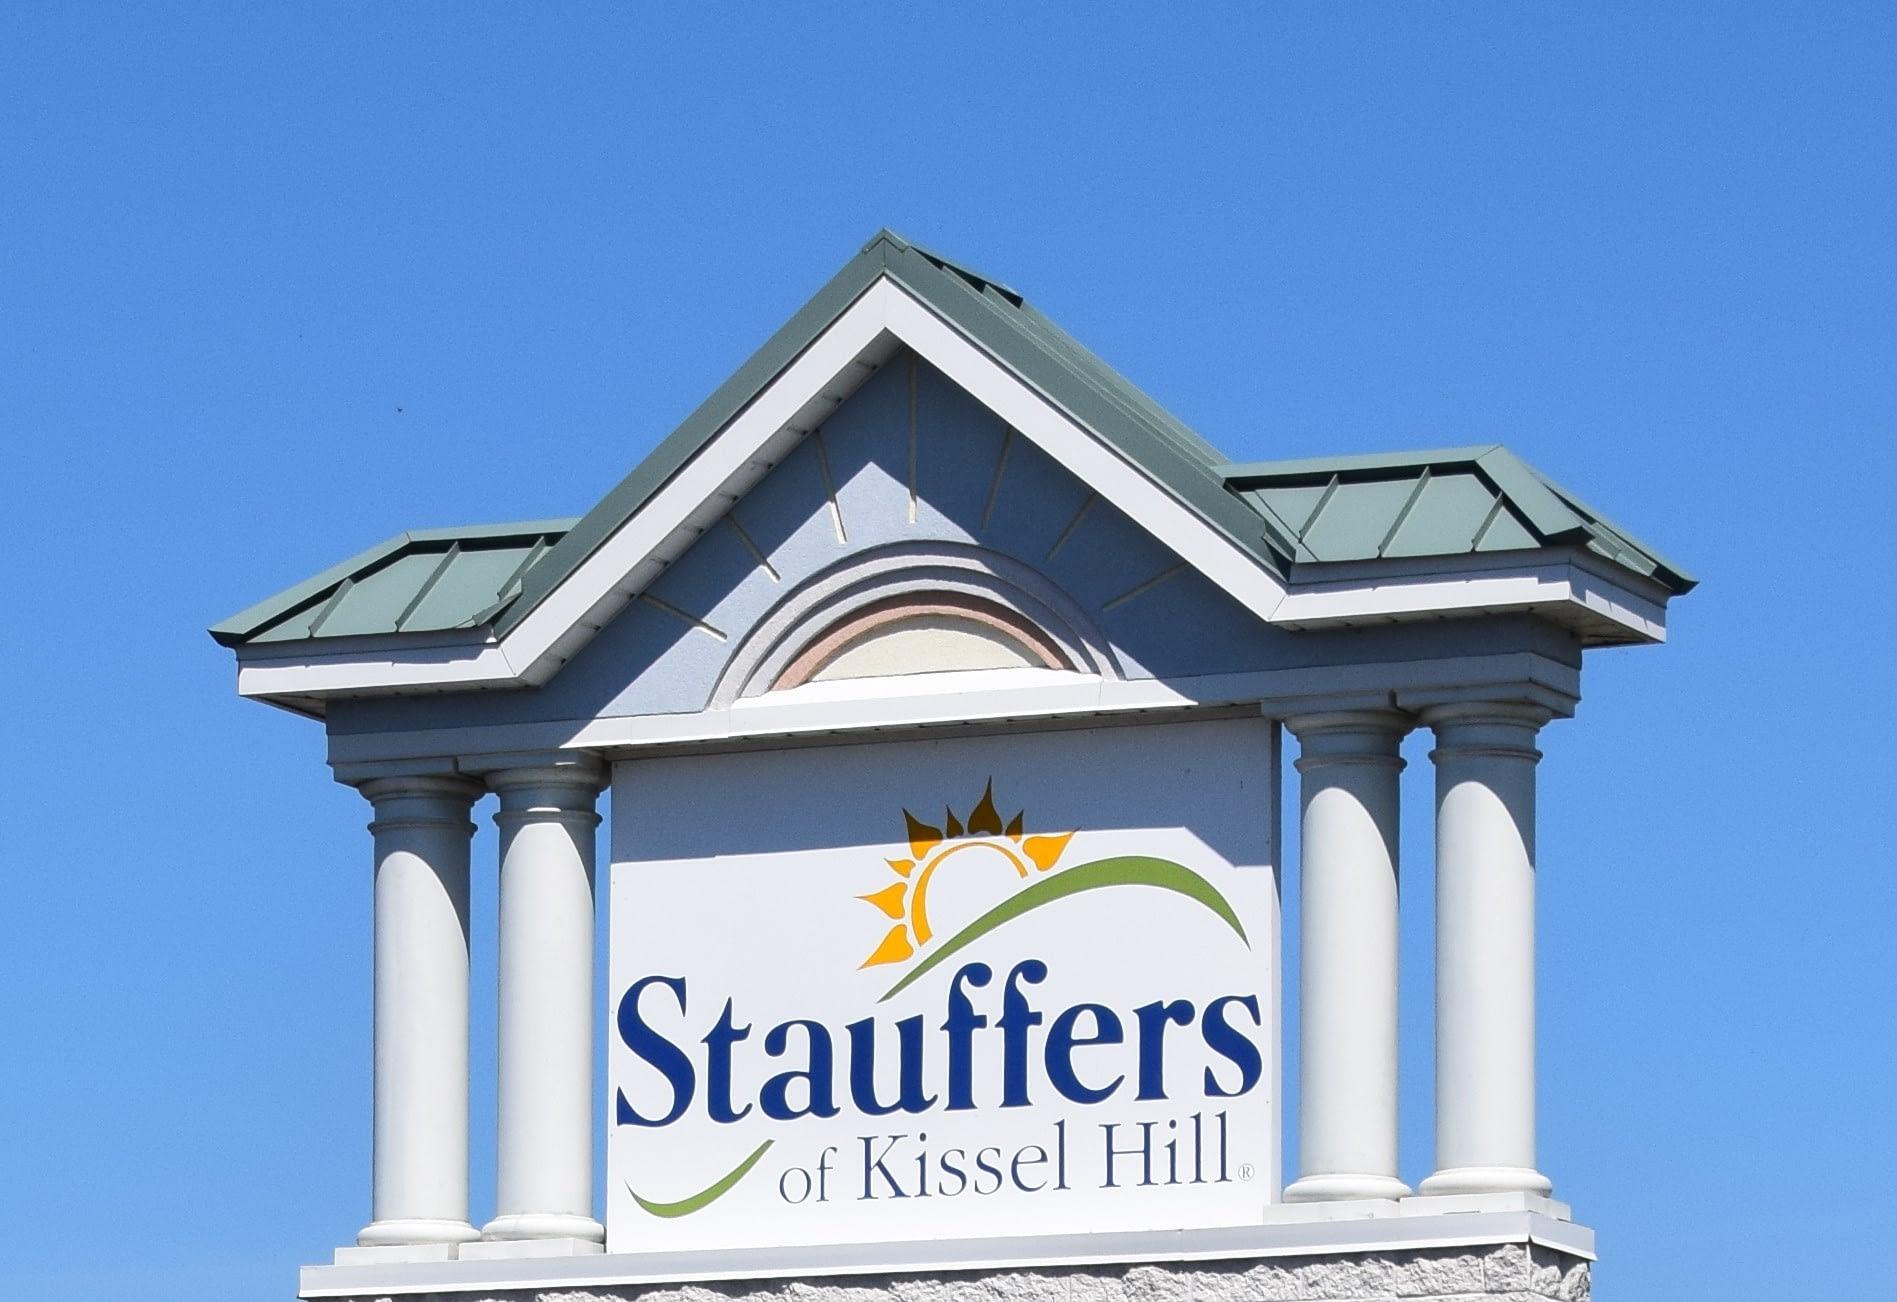 Stauffers of Kissel Hill - Sign